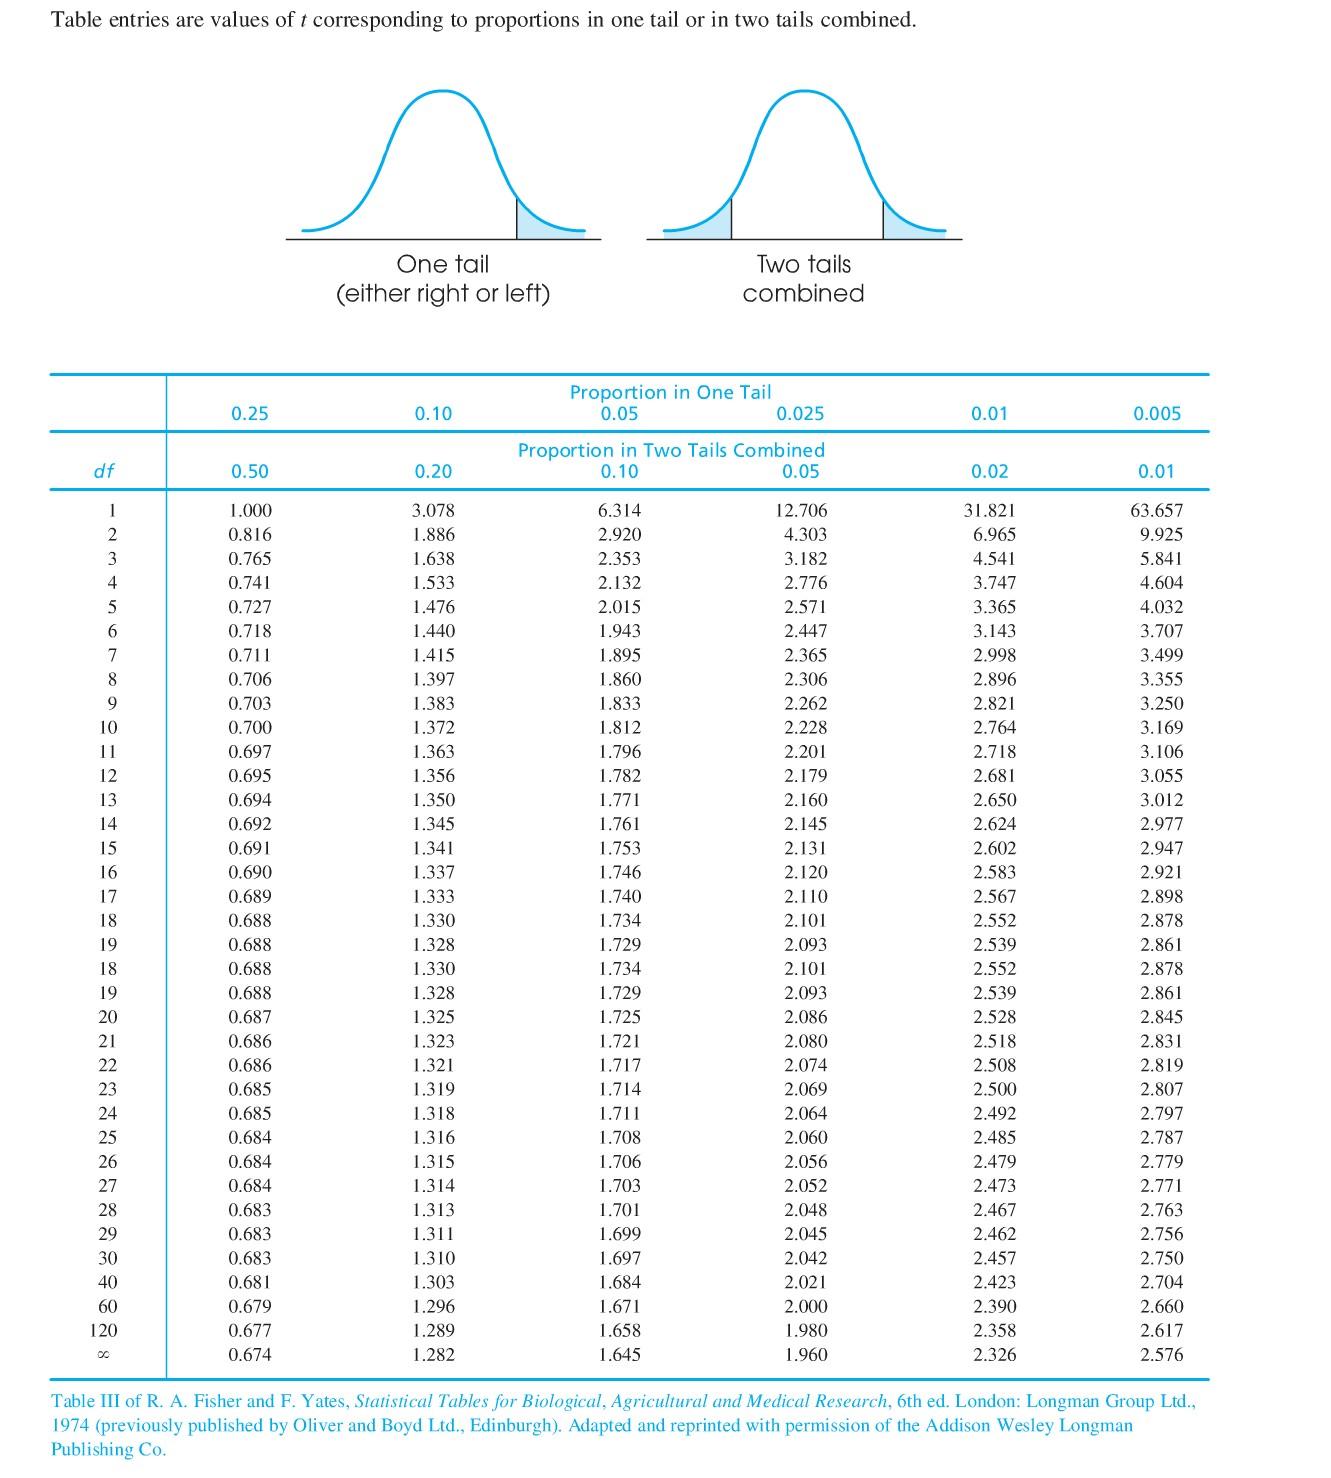 Statistics for Ptable statistics